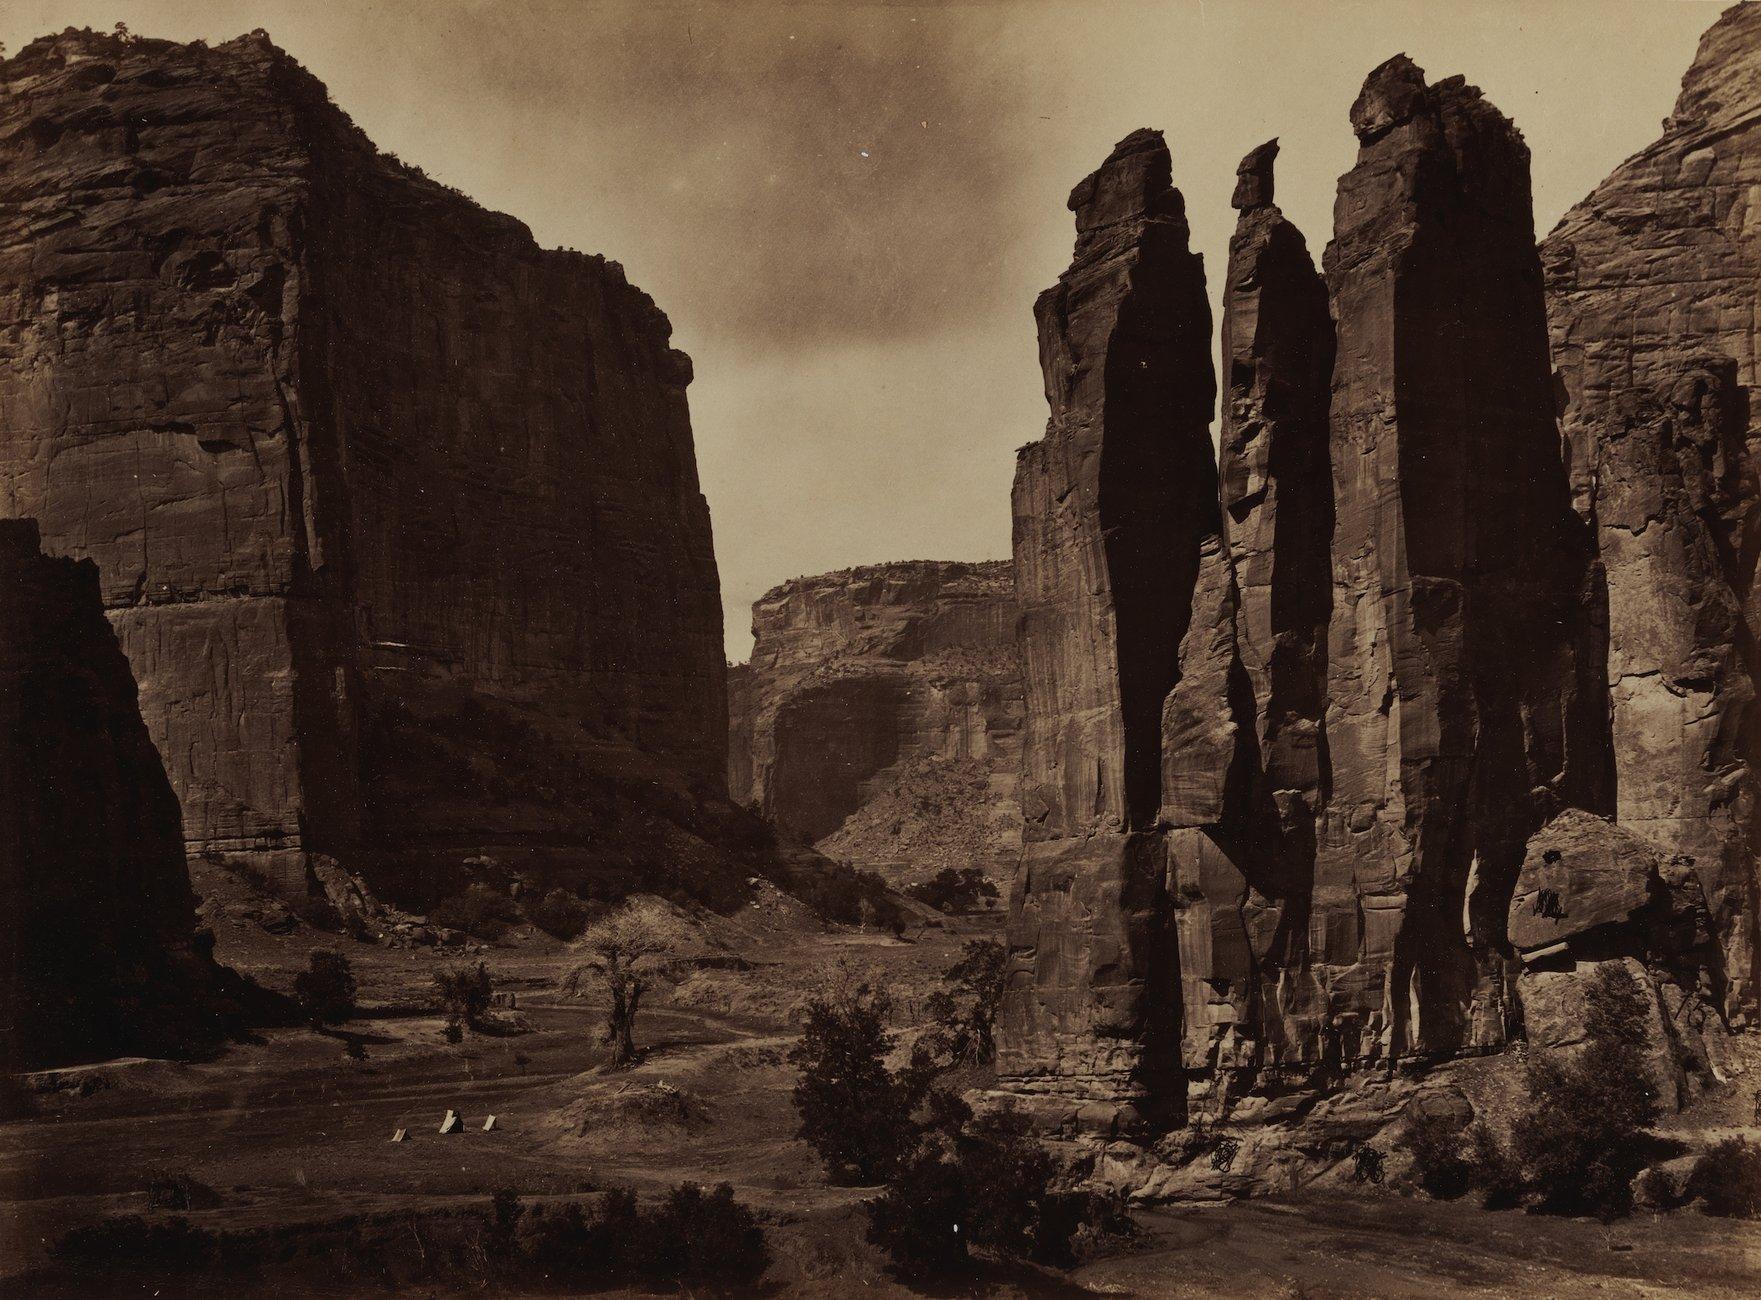 Artwork image, Timothy H. O'Sullivan's Cañon de Chelle